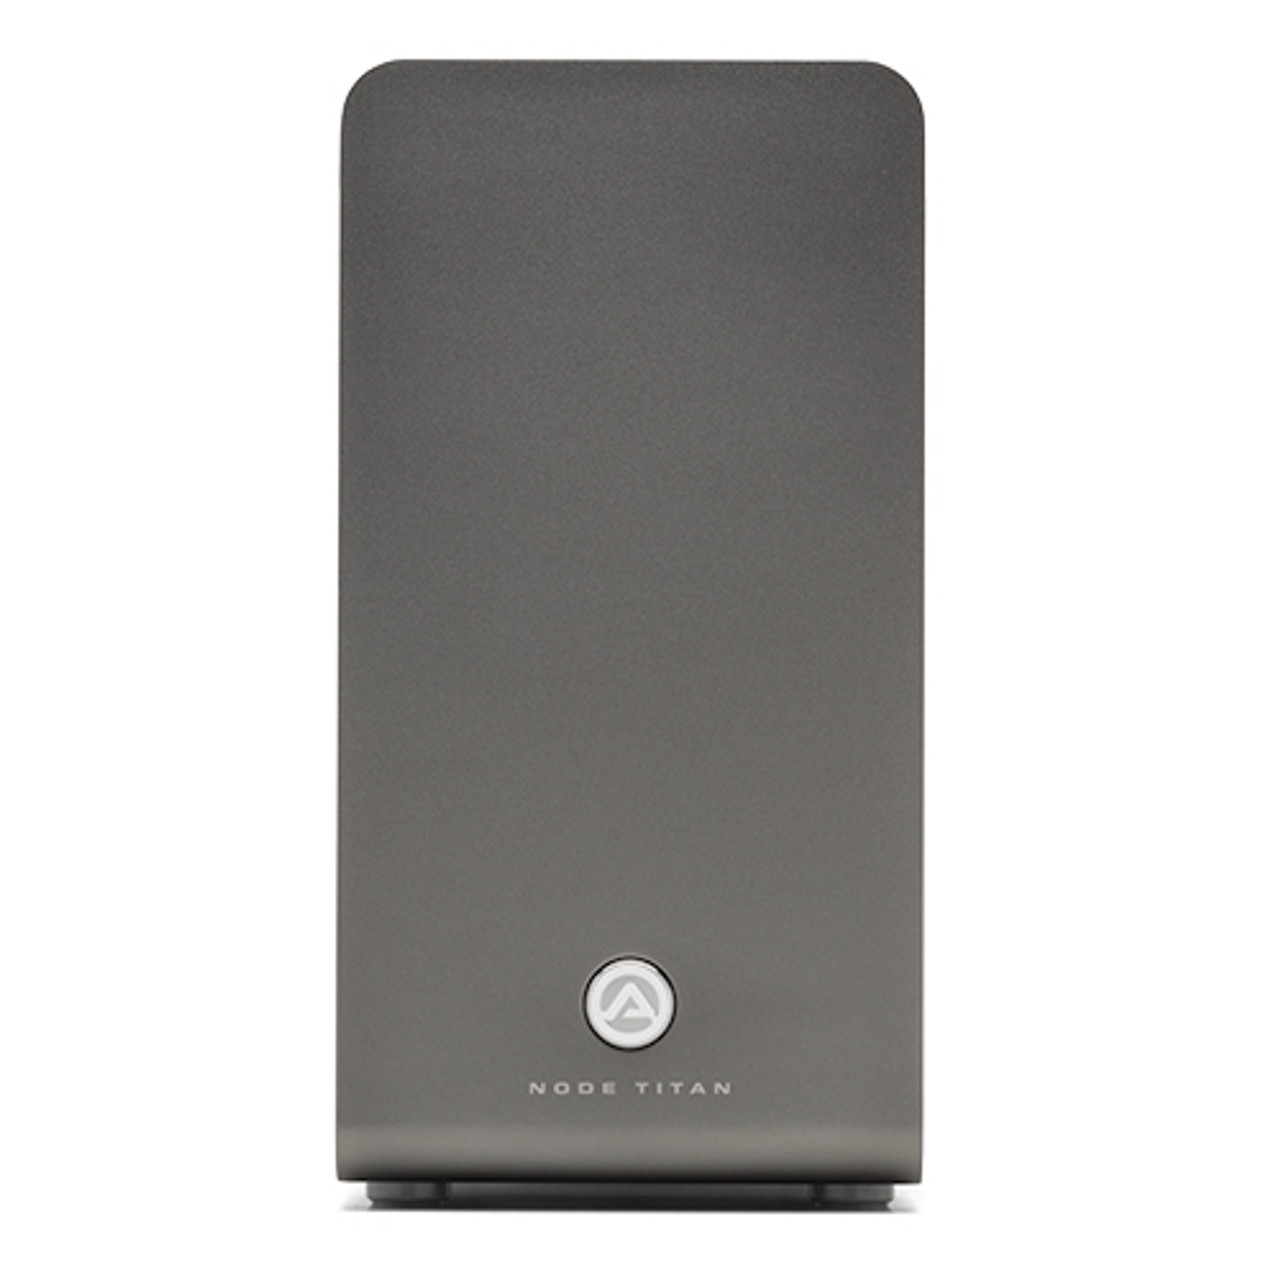 AKiTiO Node Titan Plug & Play Thunderbolt 3 External GPU (eGPU) Solution - enclosure